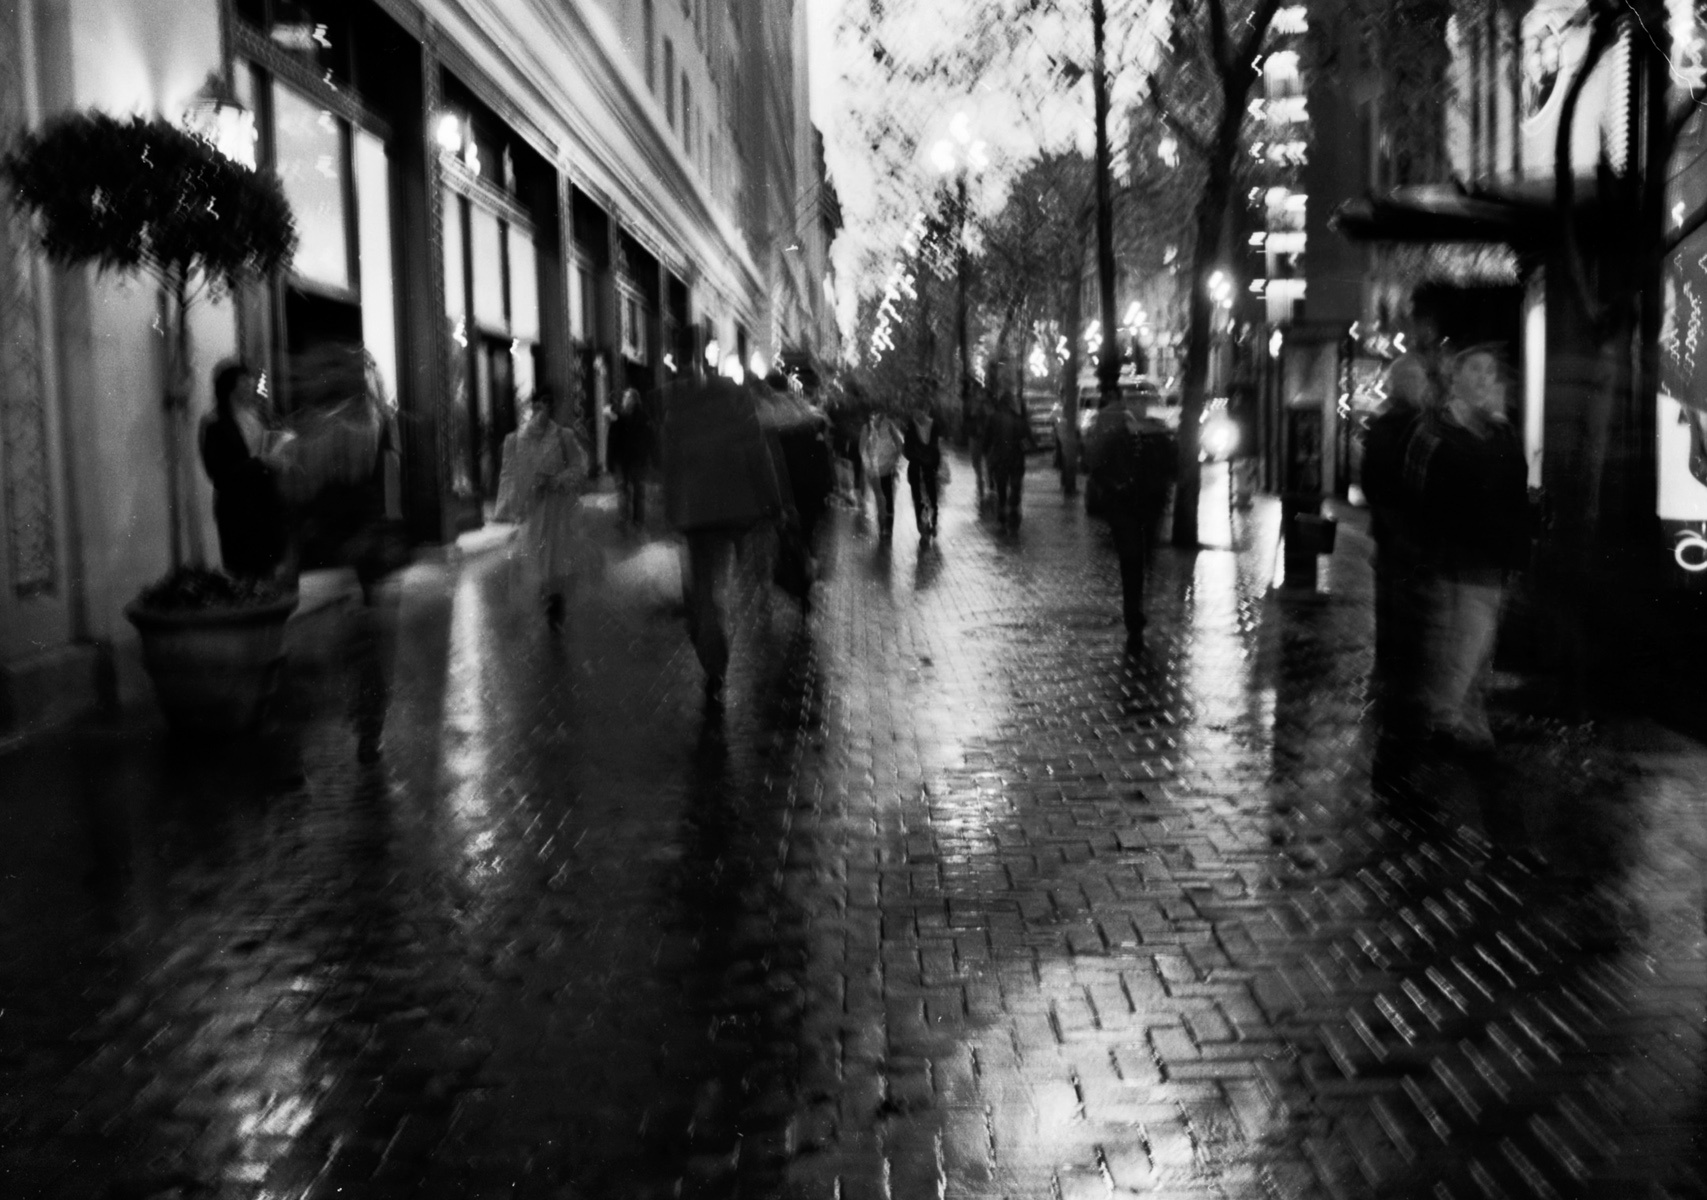 Market St. Haze After the Rain, San Francisco